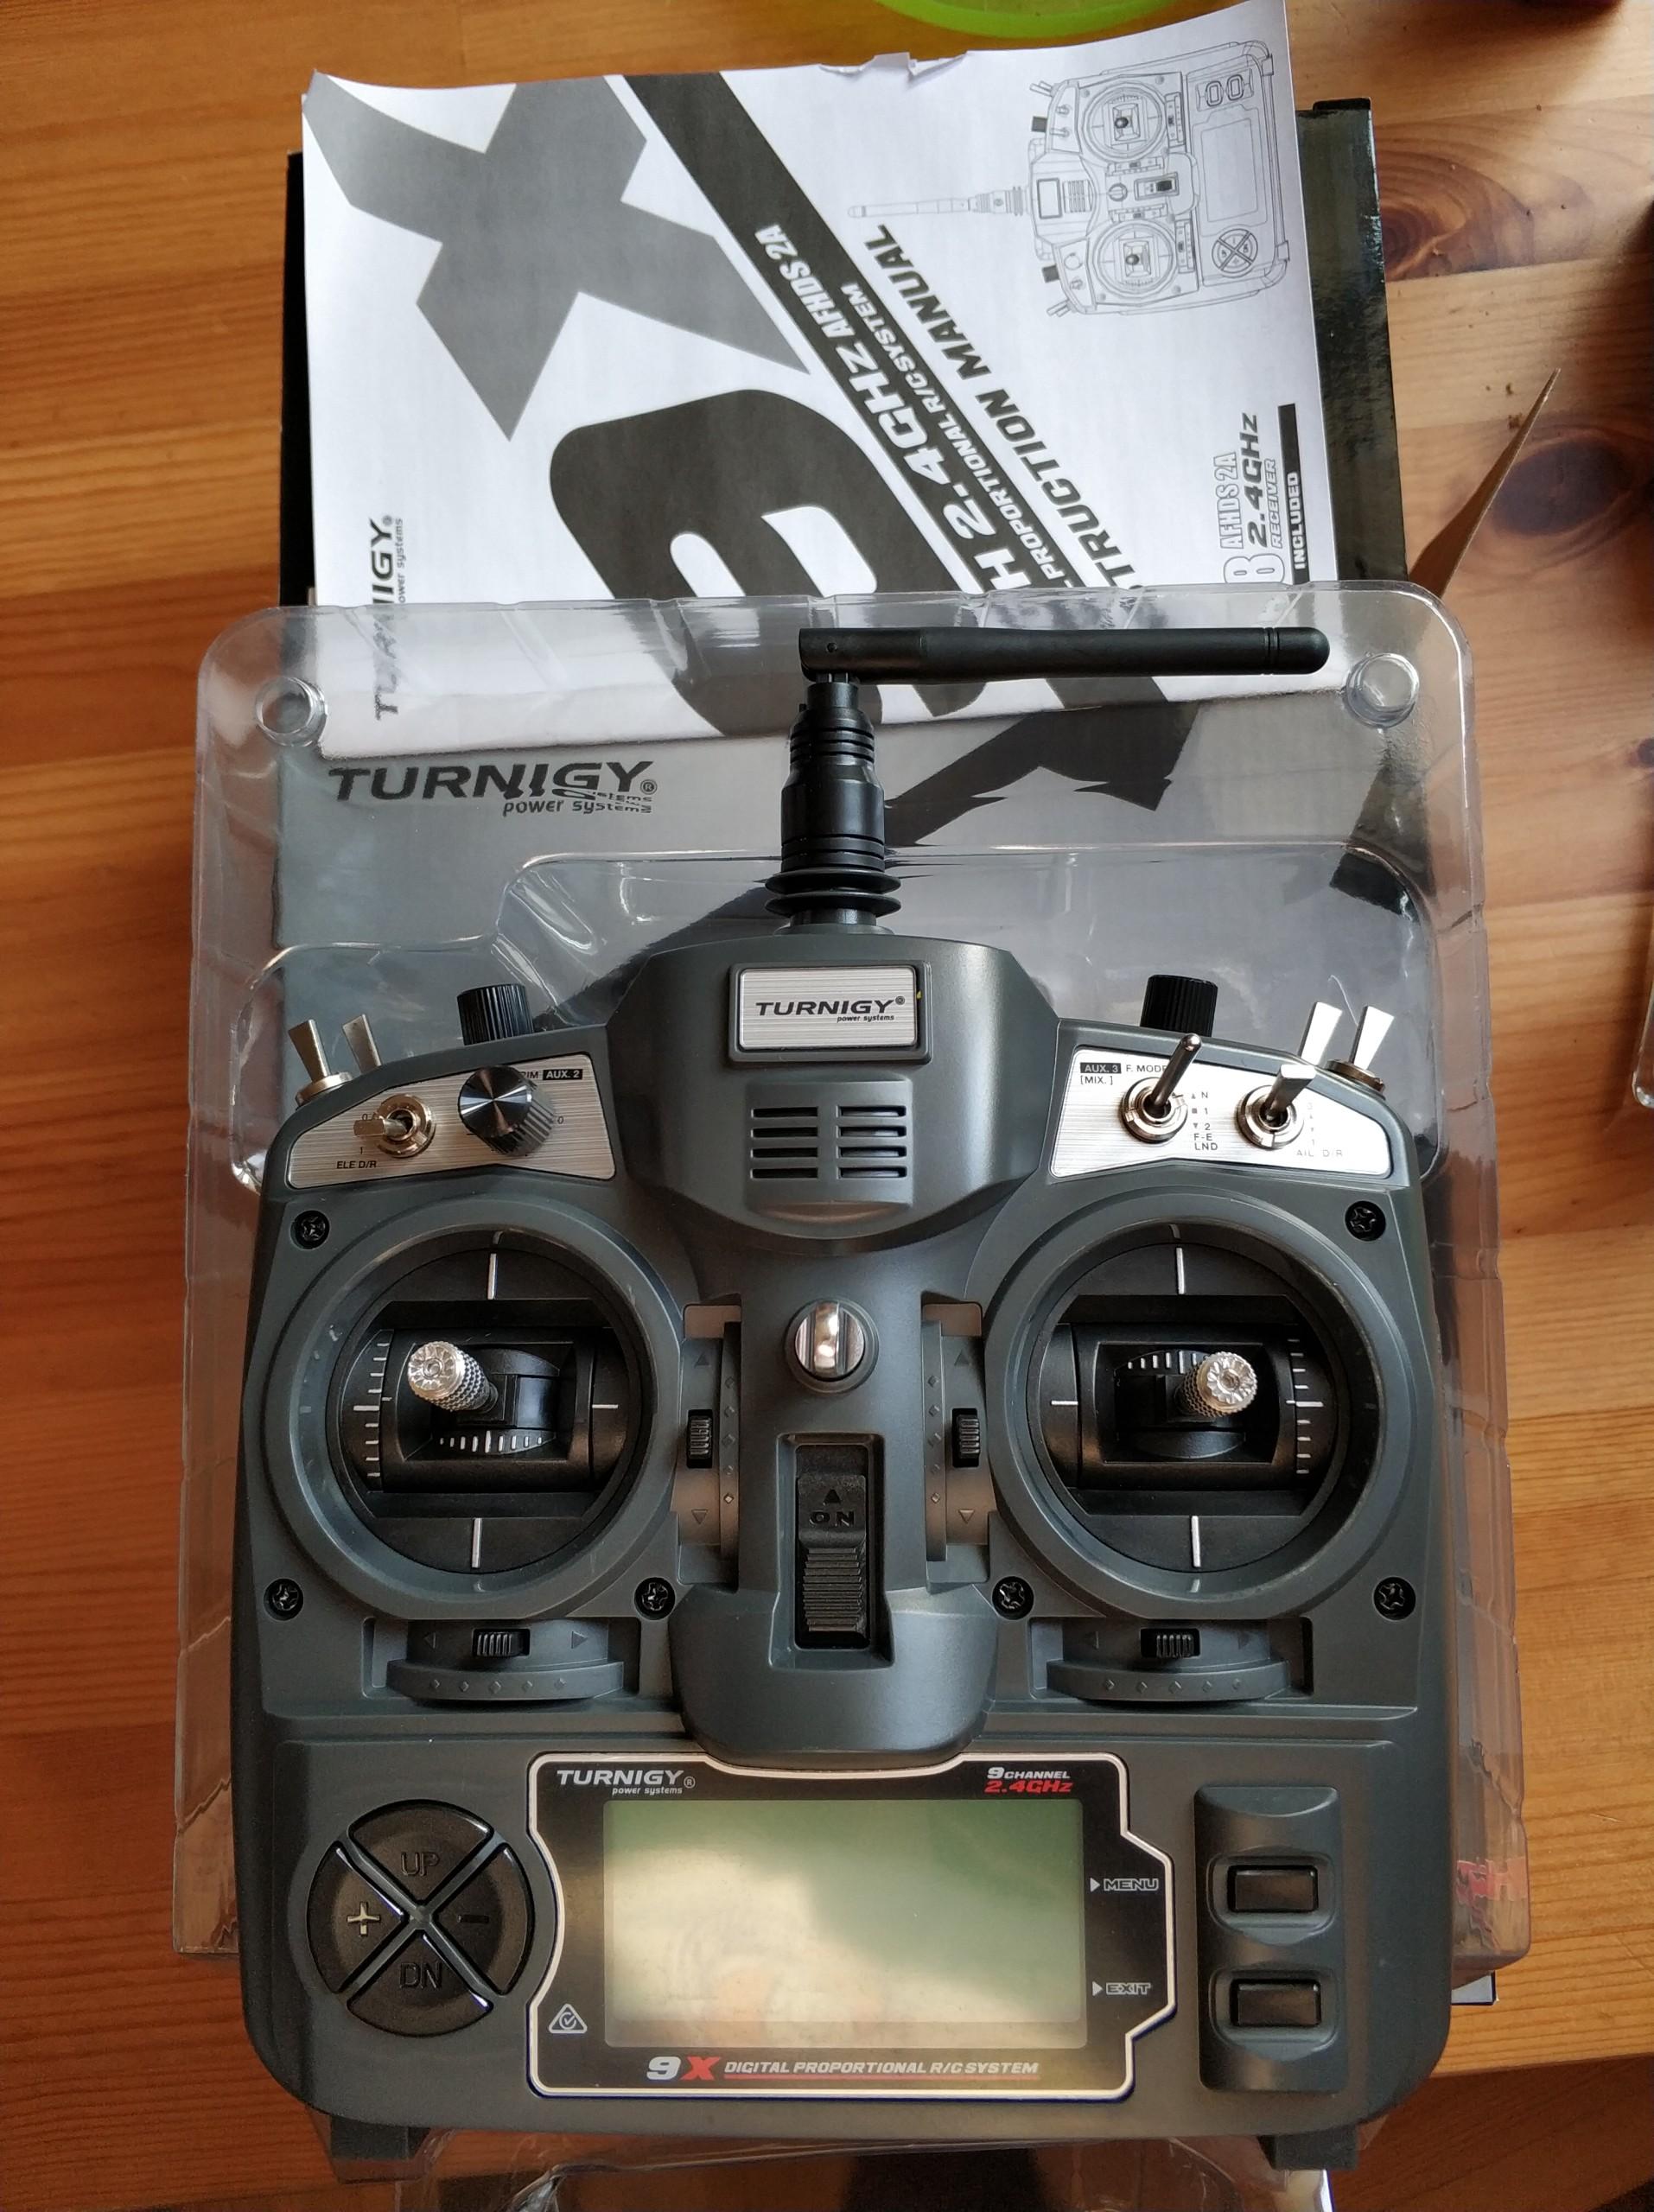 Aparatura Turnigy 9X AFHDS 2A iA8 MODE 2